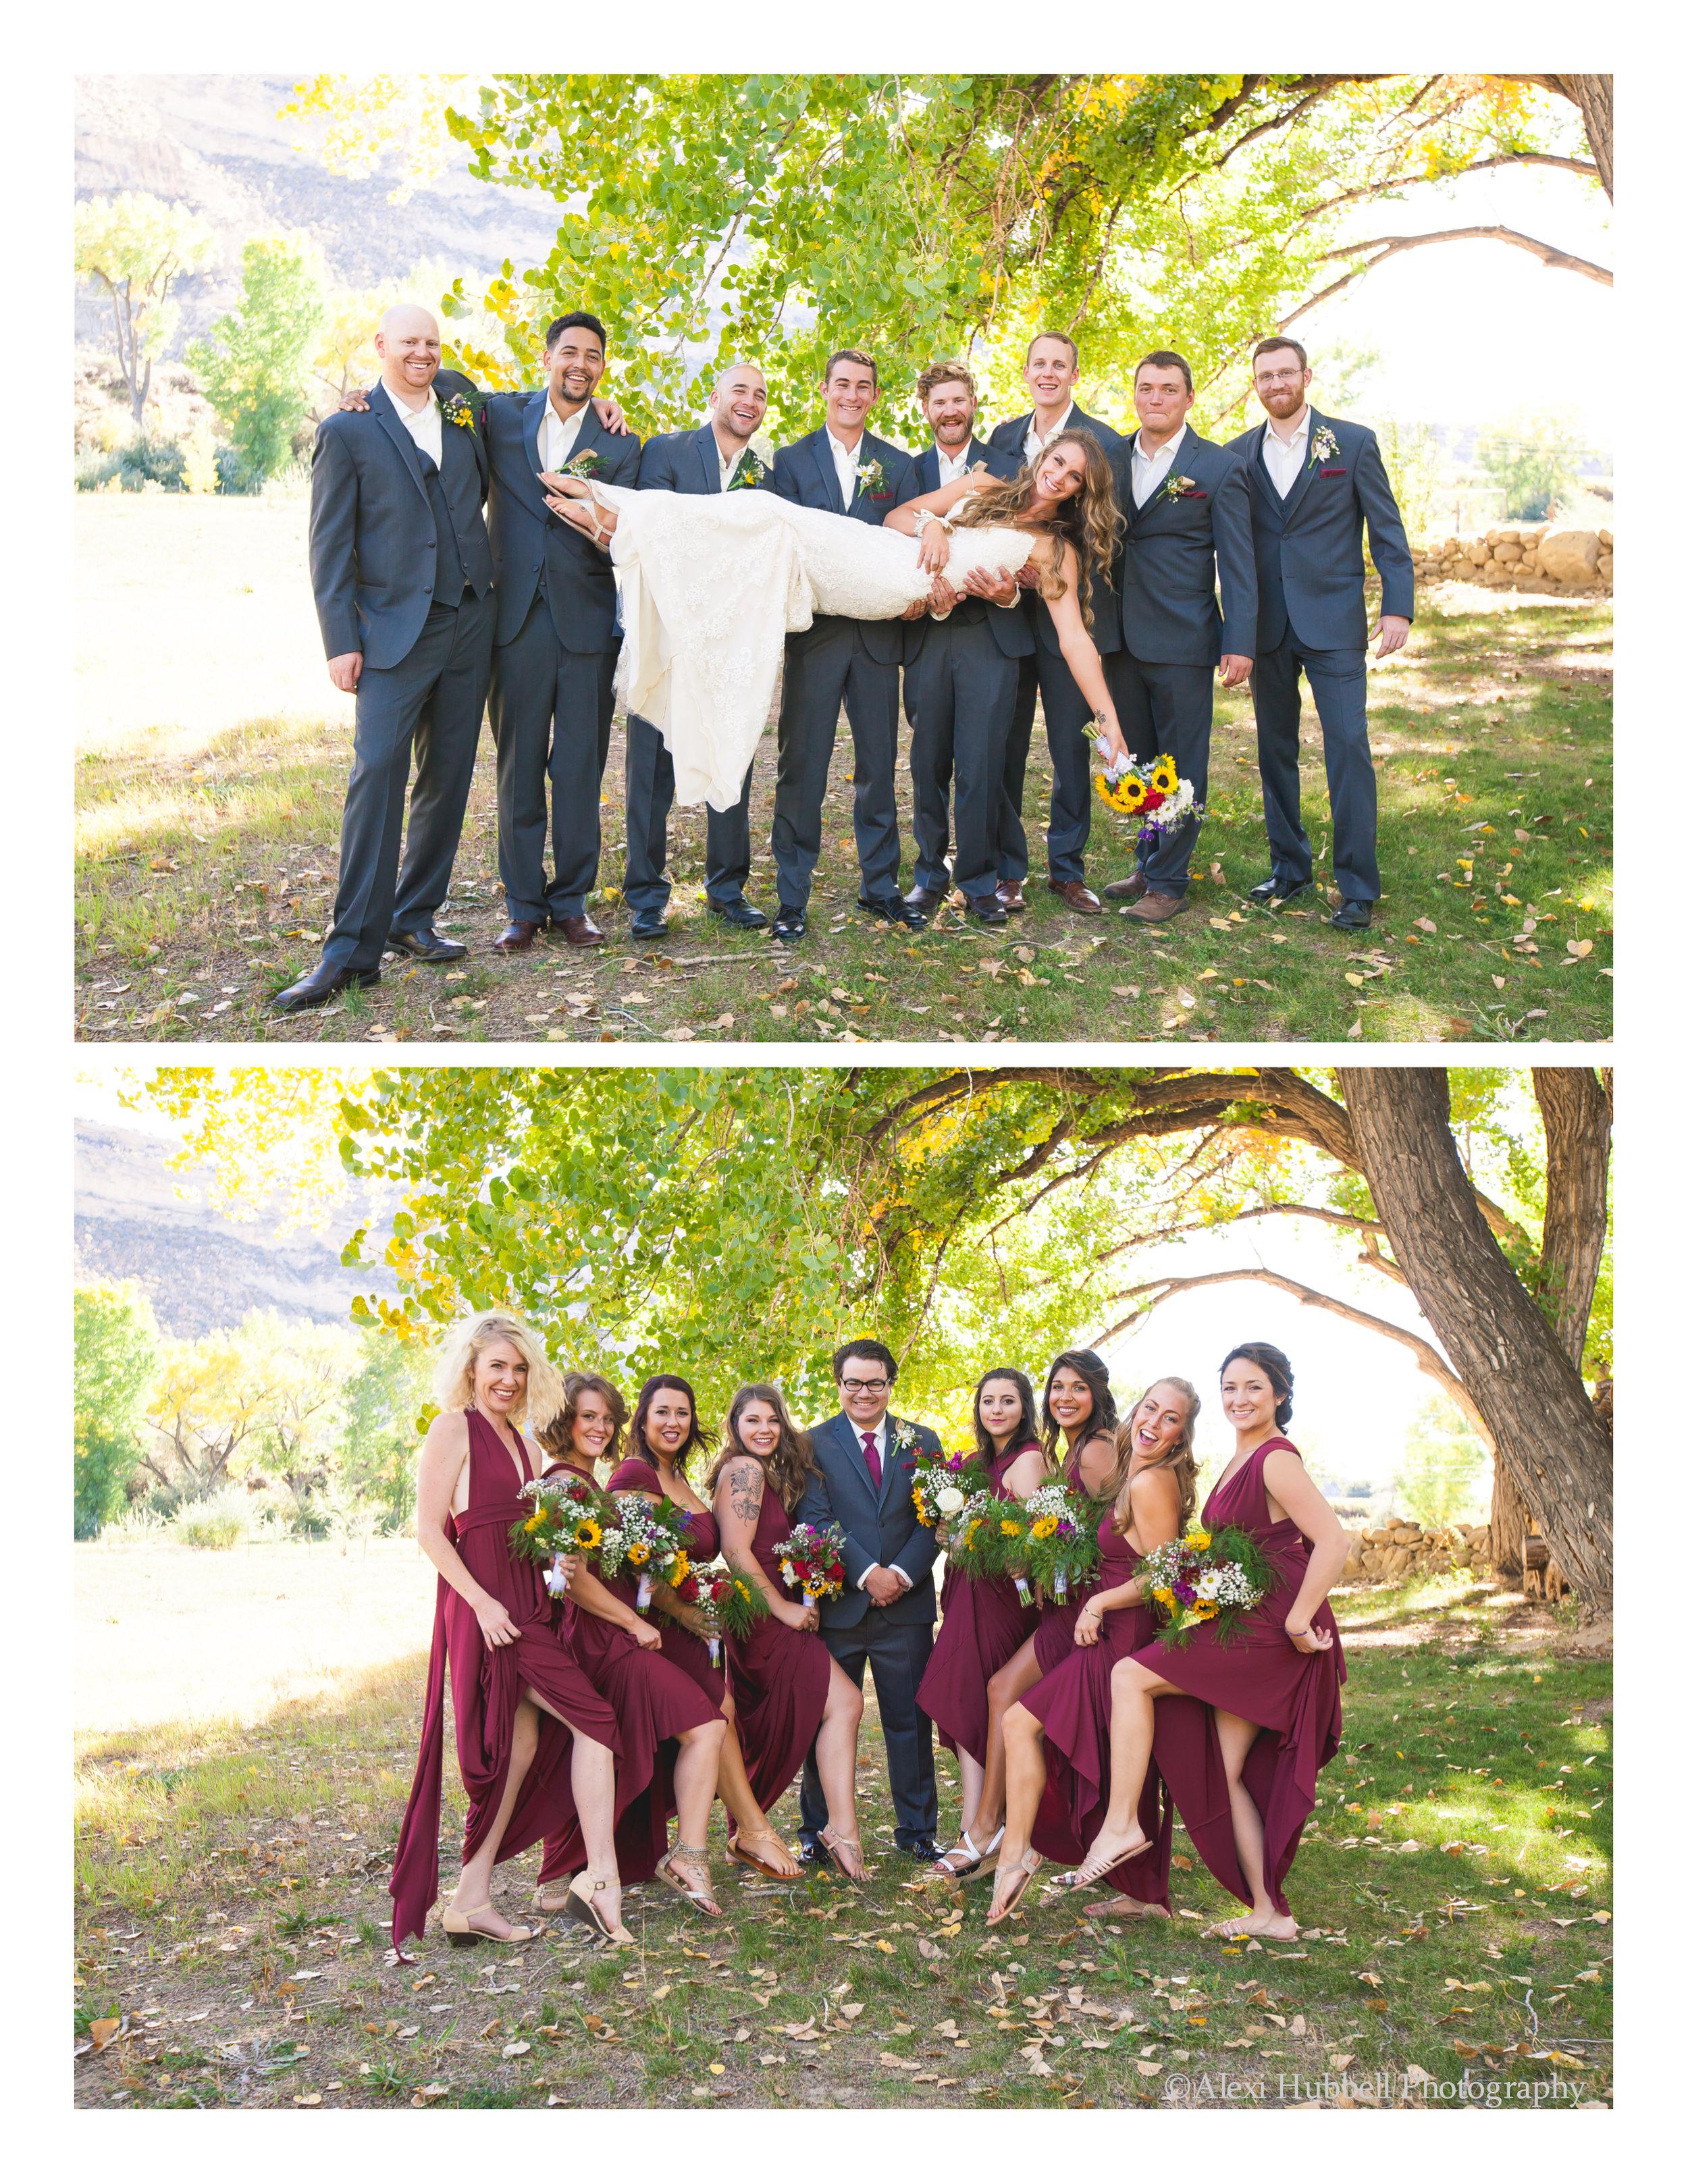 Durango Colorado Destination Wedding Photography, New Mexico Wedding, Wines of The San Juan